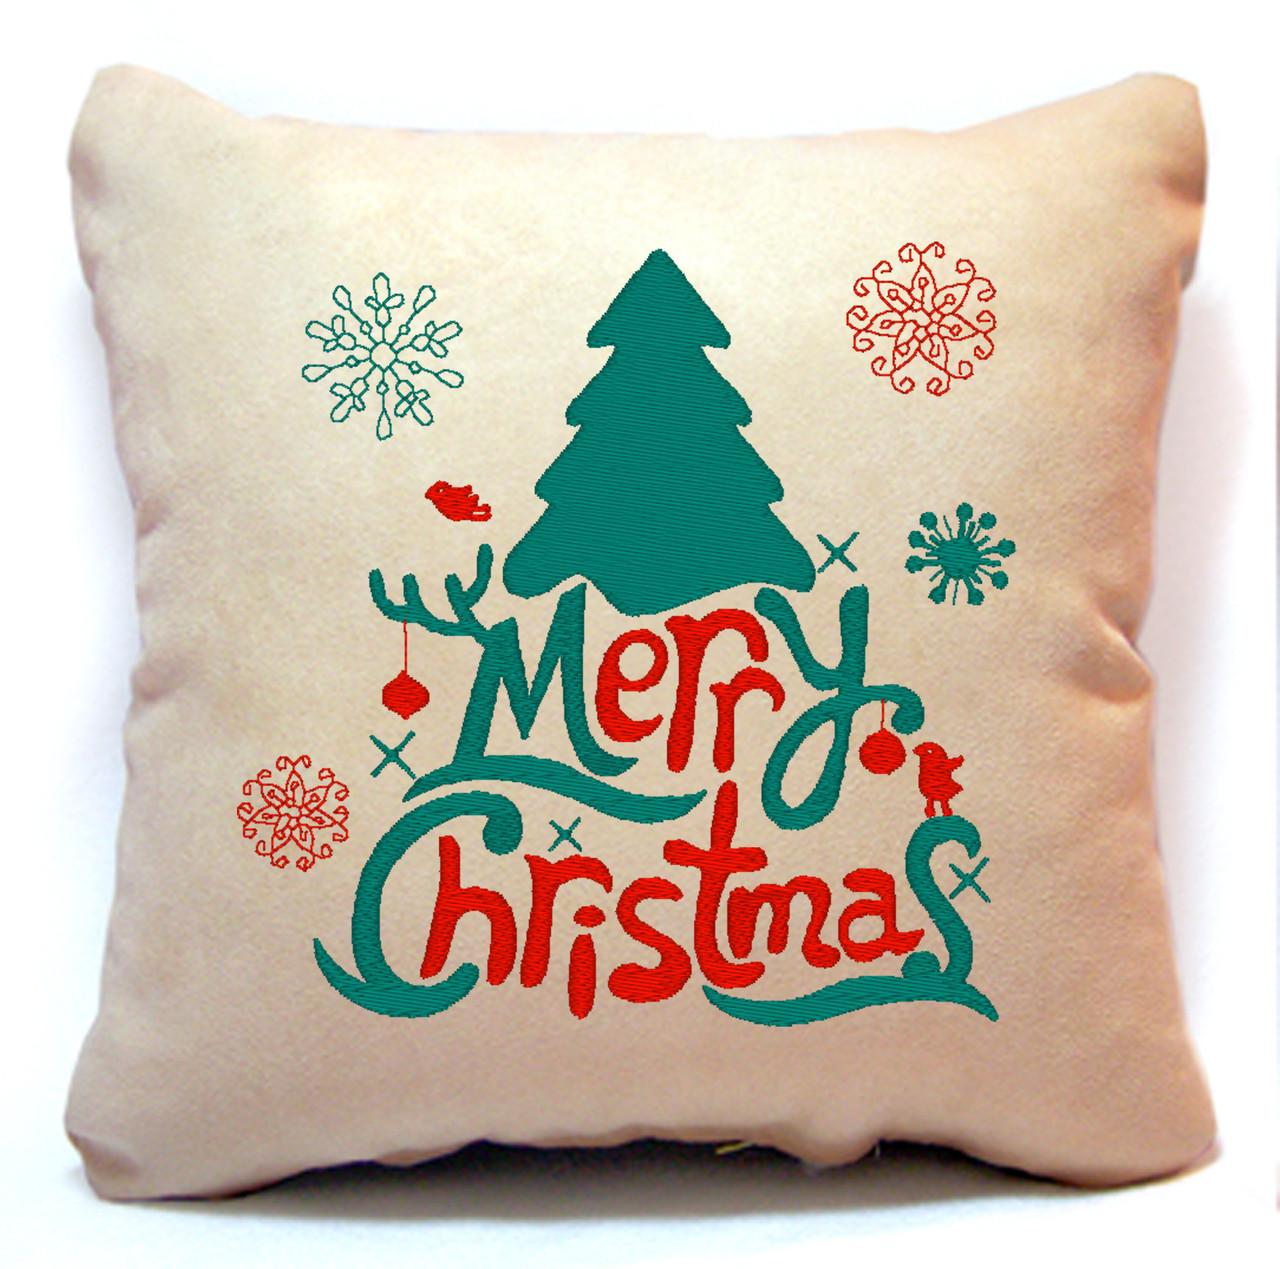 "Новогодняя подушка Slivki ""Merry Christmas!"" 44, цвет бежевый 30х30см"